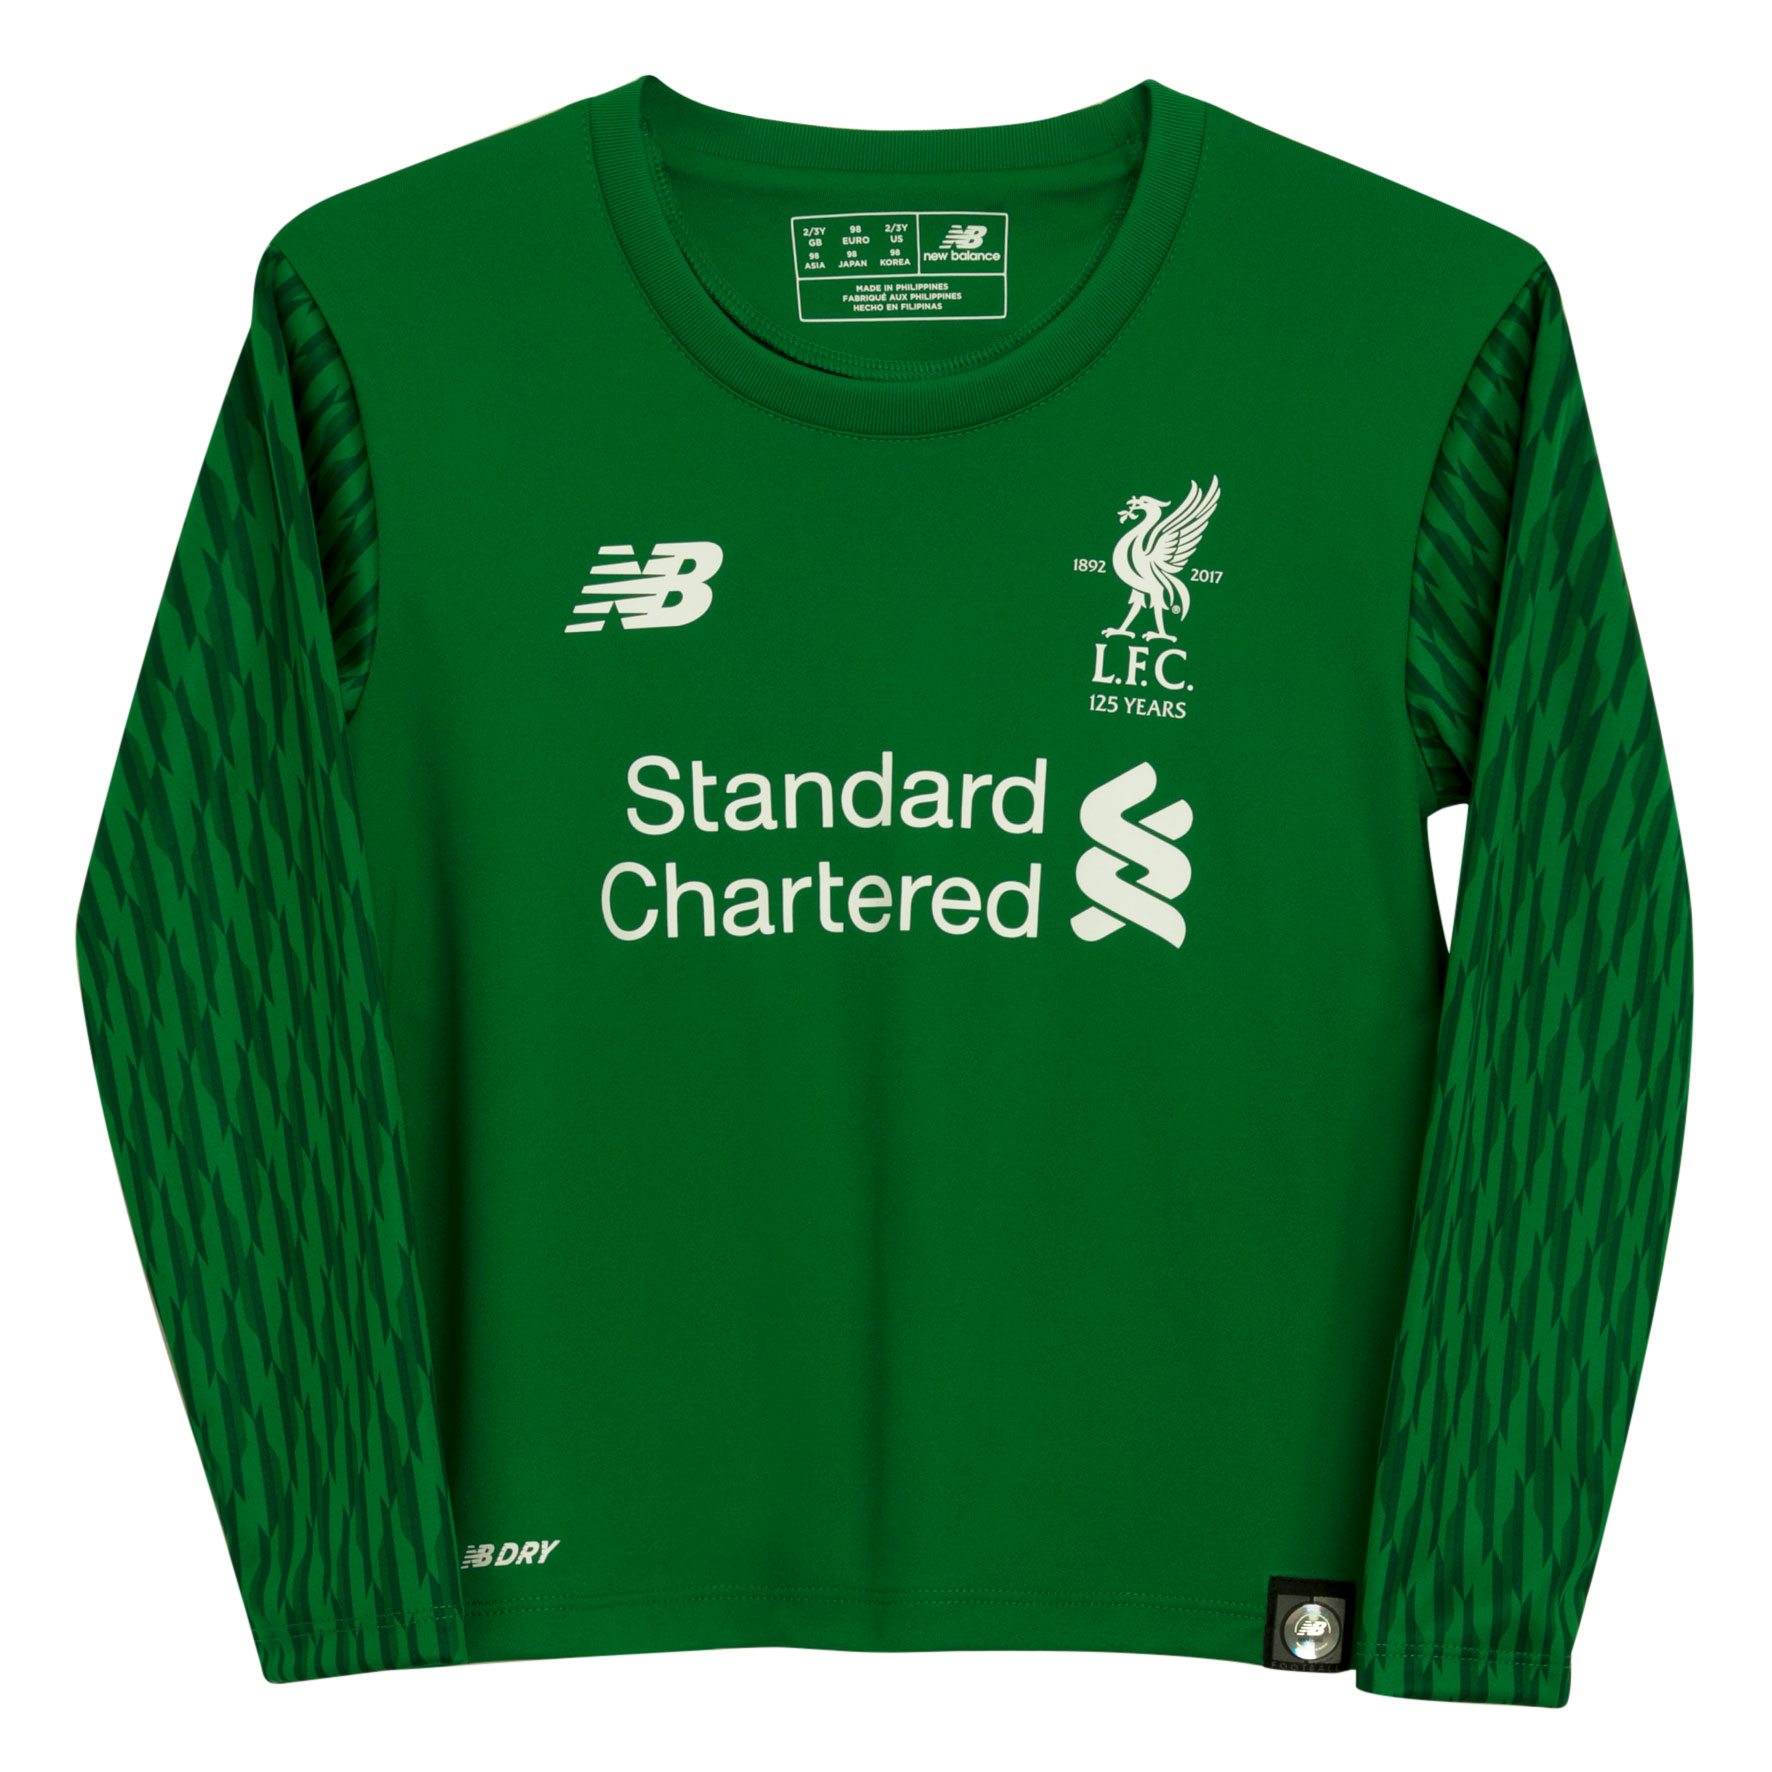 HD Liverpool goalkeeper kit.